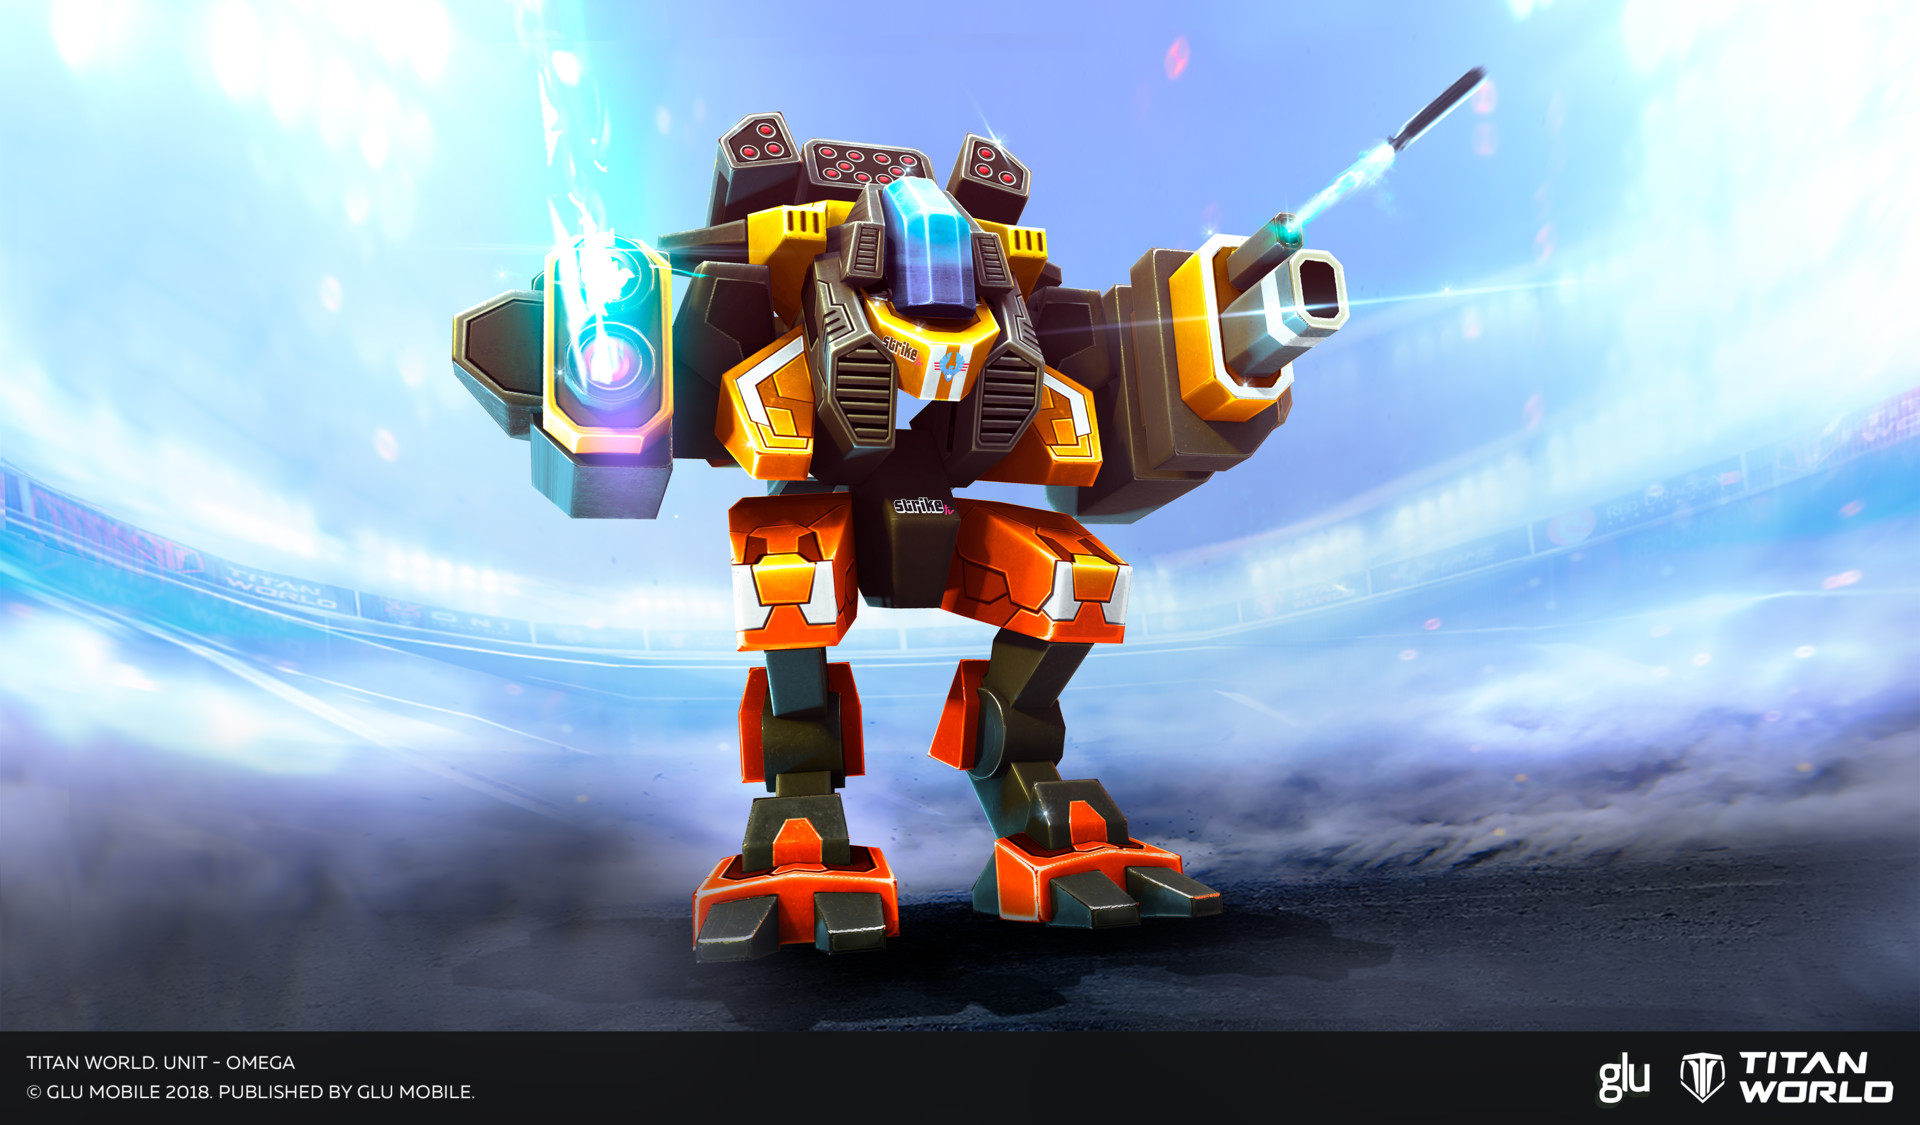 Unit - Omega